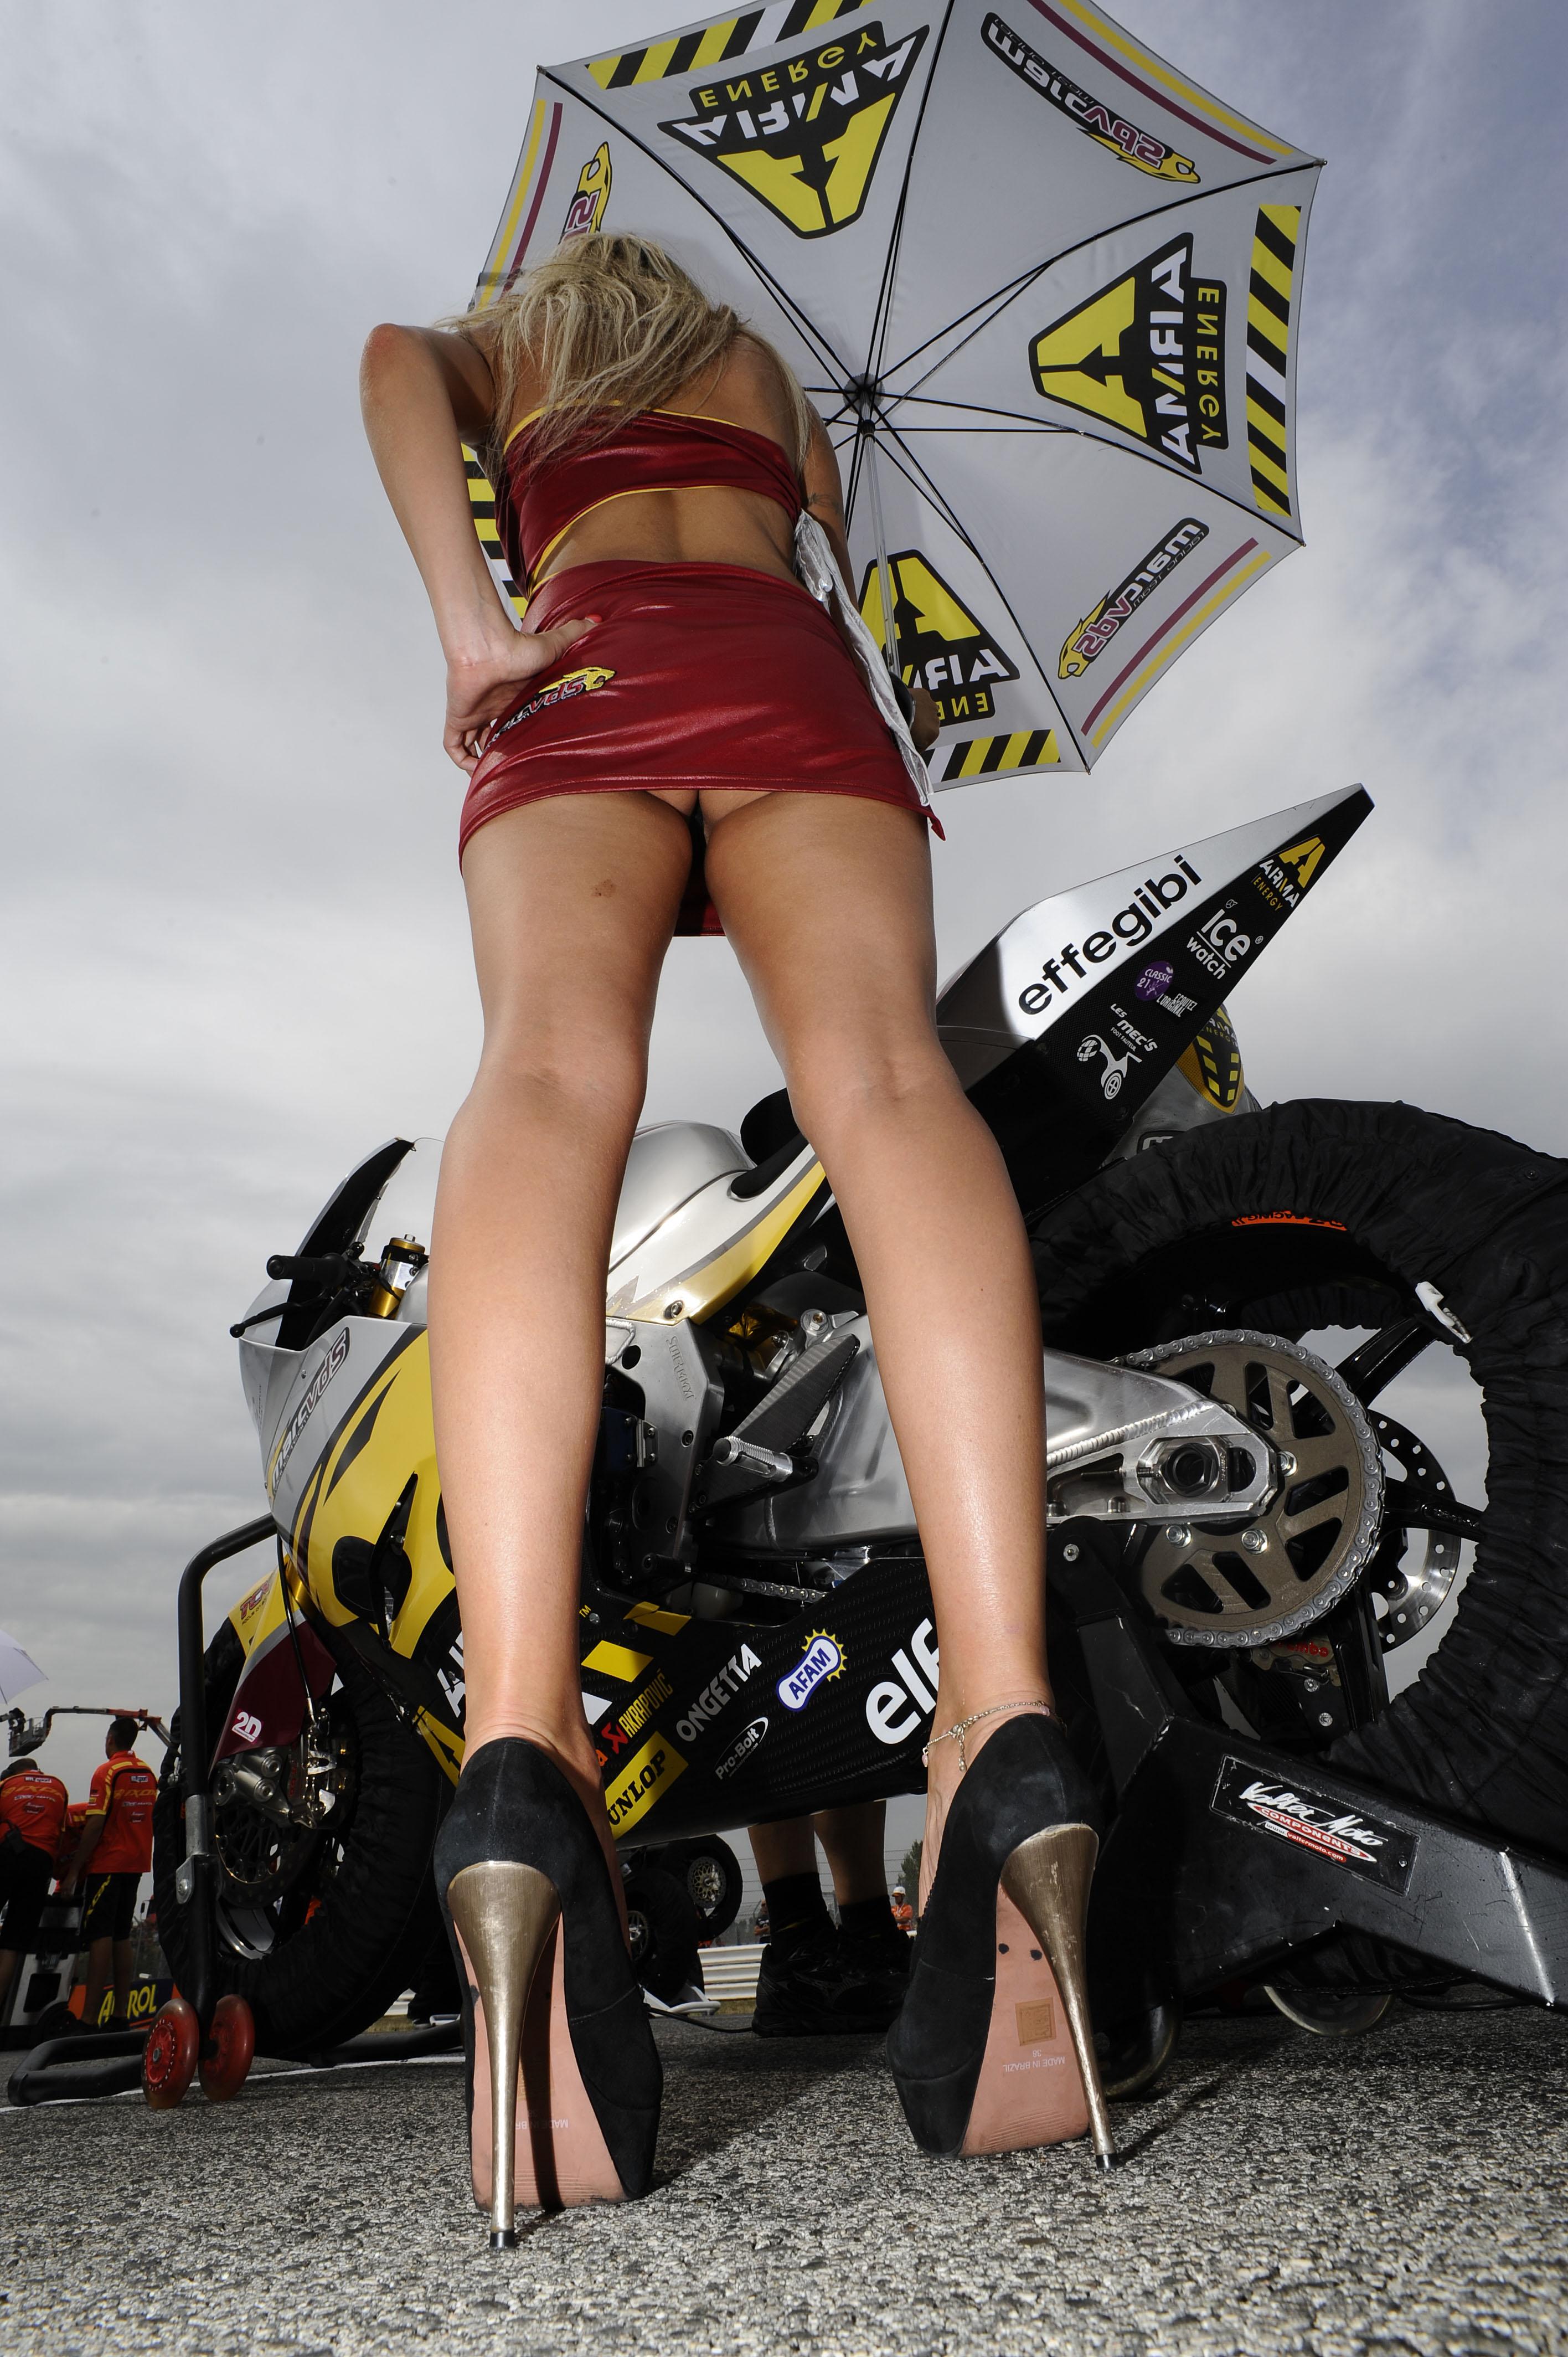 Hot monster racing girls naked — pic 9